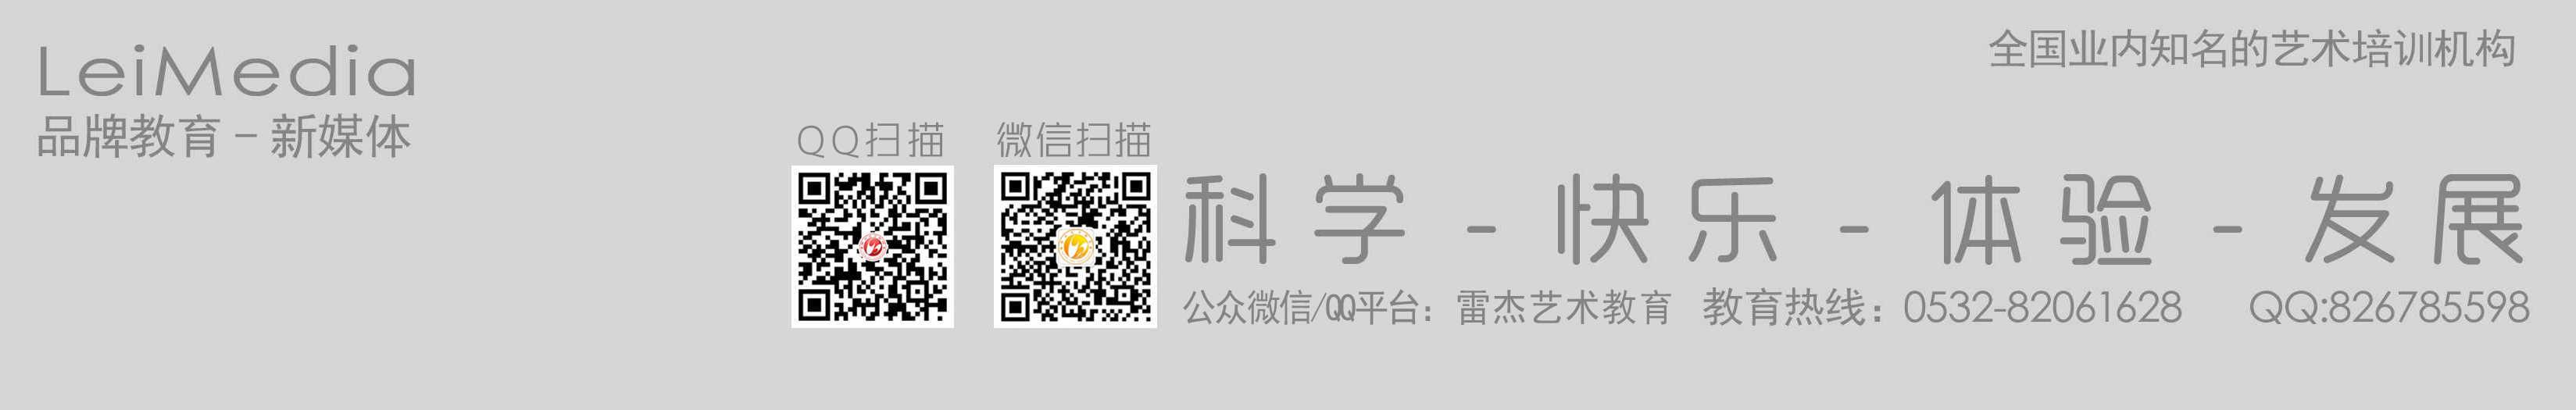 雷杰艺术学校 banner